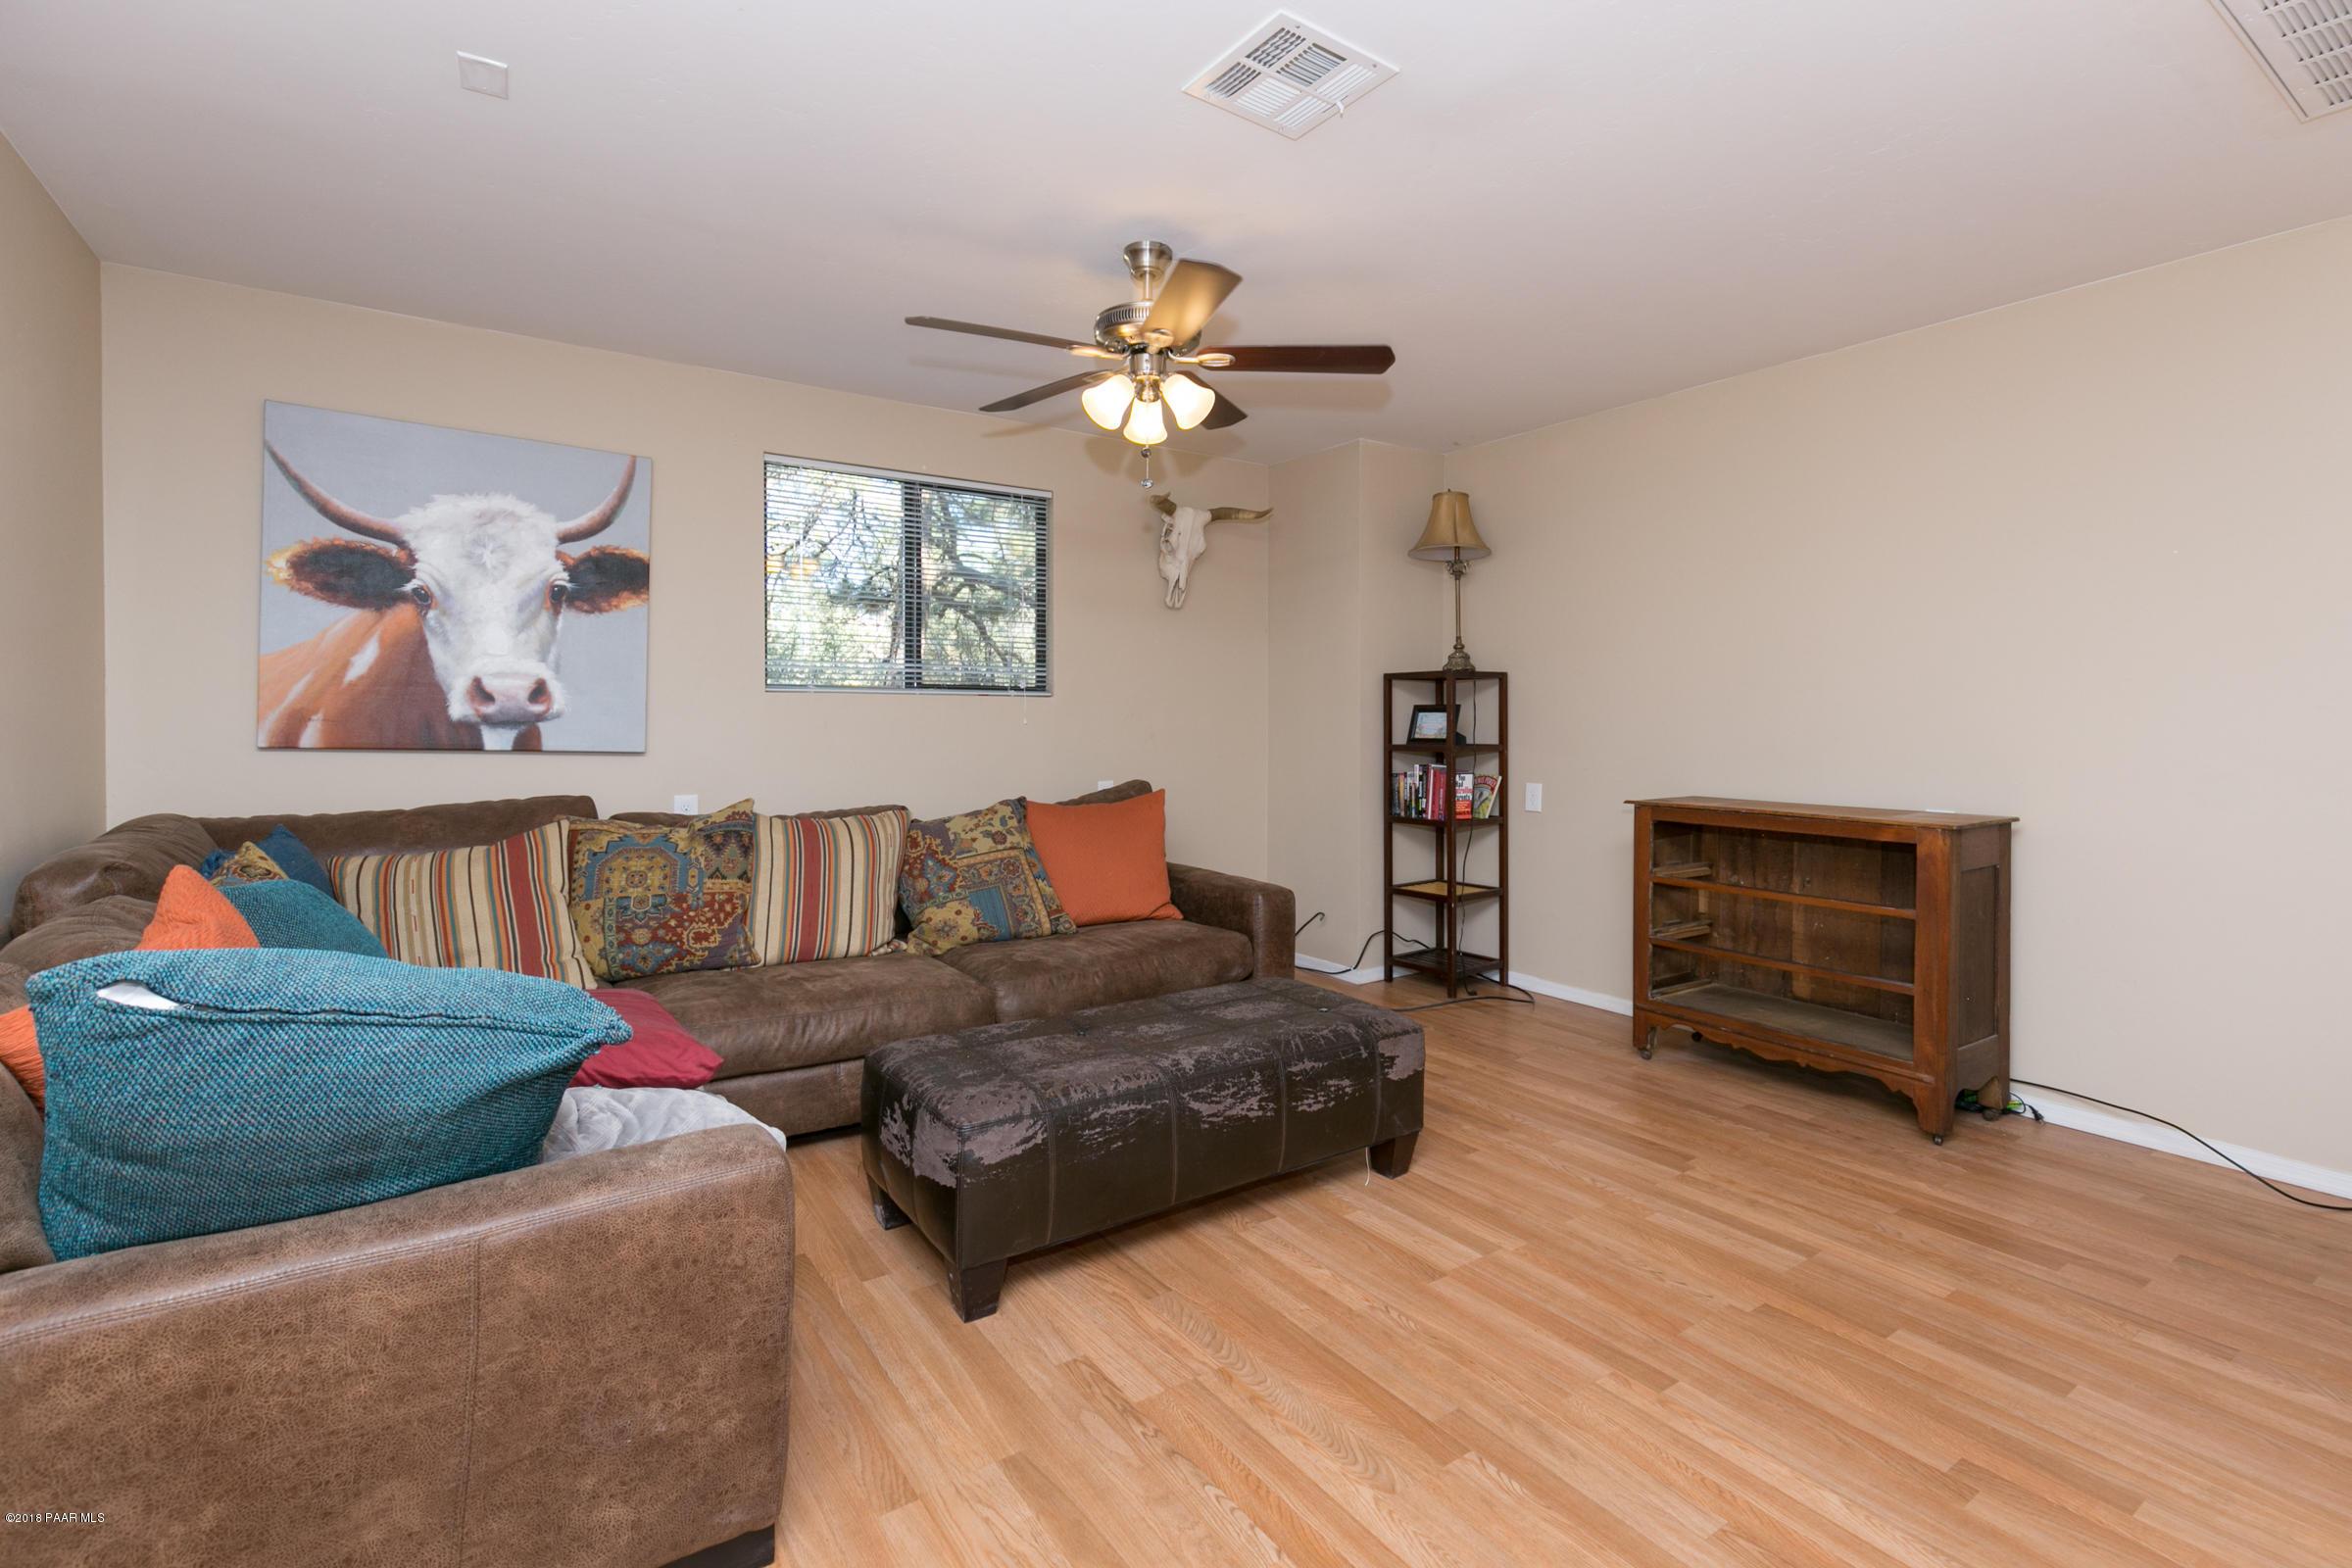 711 W Vista Way Prescott, AZ 86303 - MLS #: 1013412